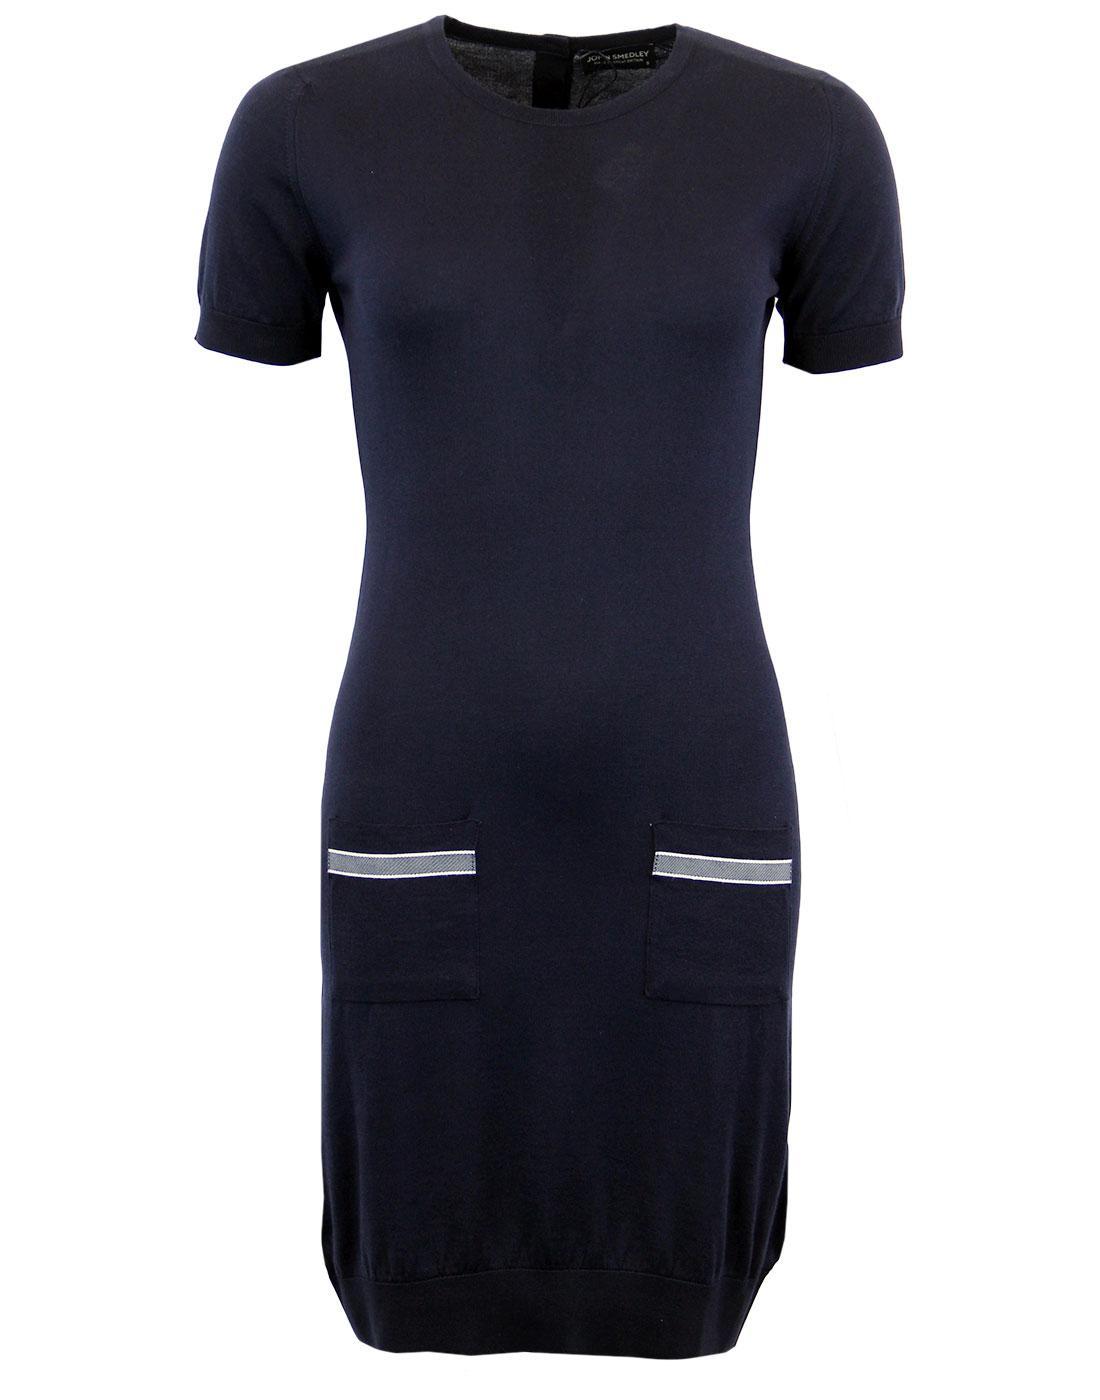 Isobella JOHN SMEDLEY Retro 60s Shift Dress